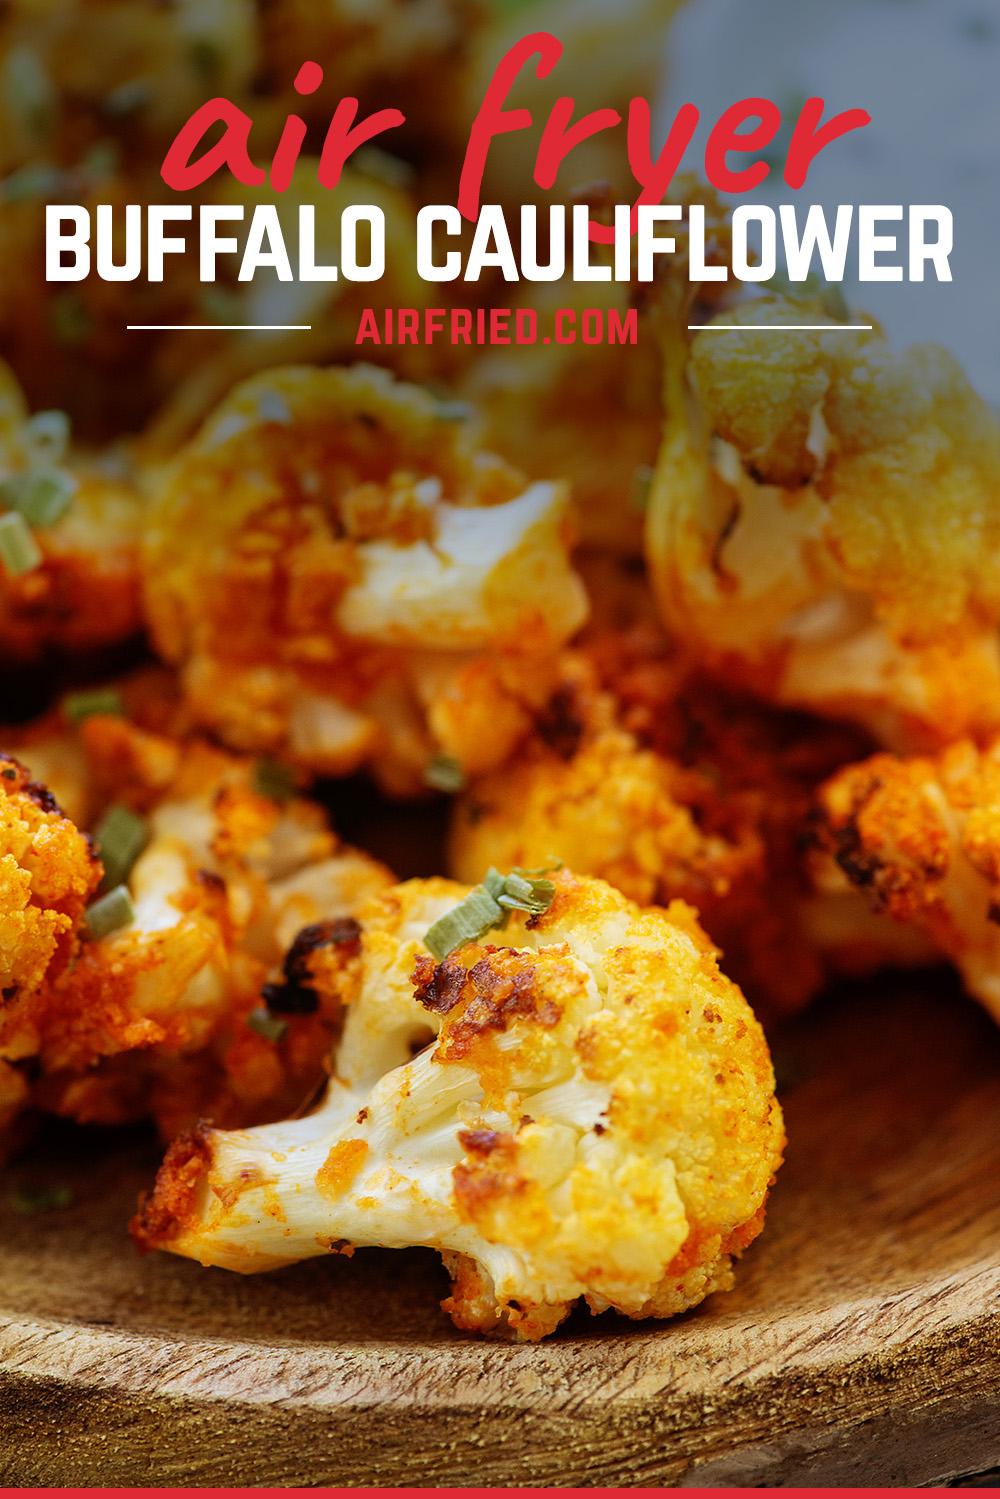 Buffalo cauliflower on a wooden plate up close.